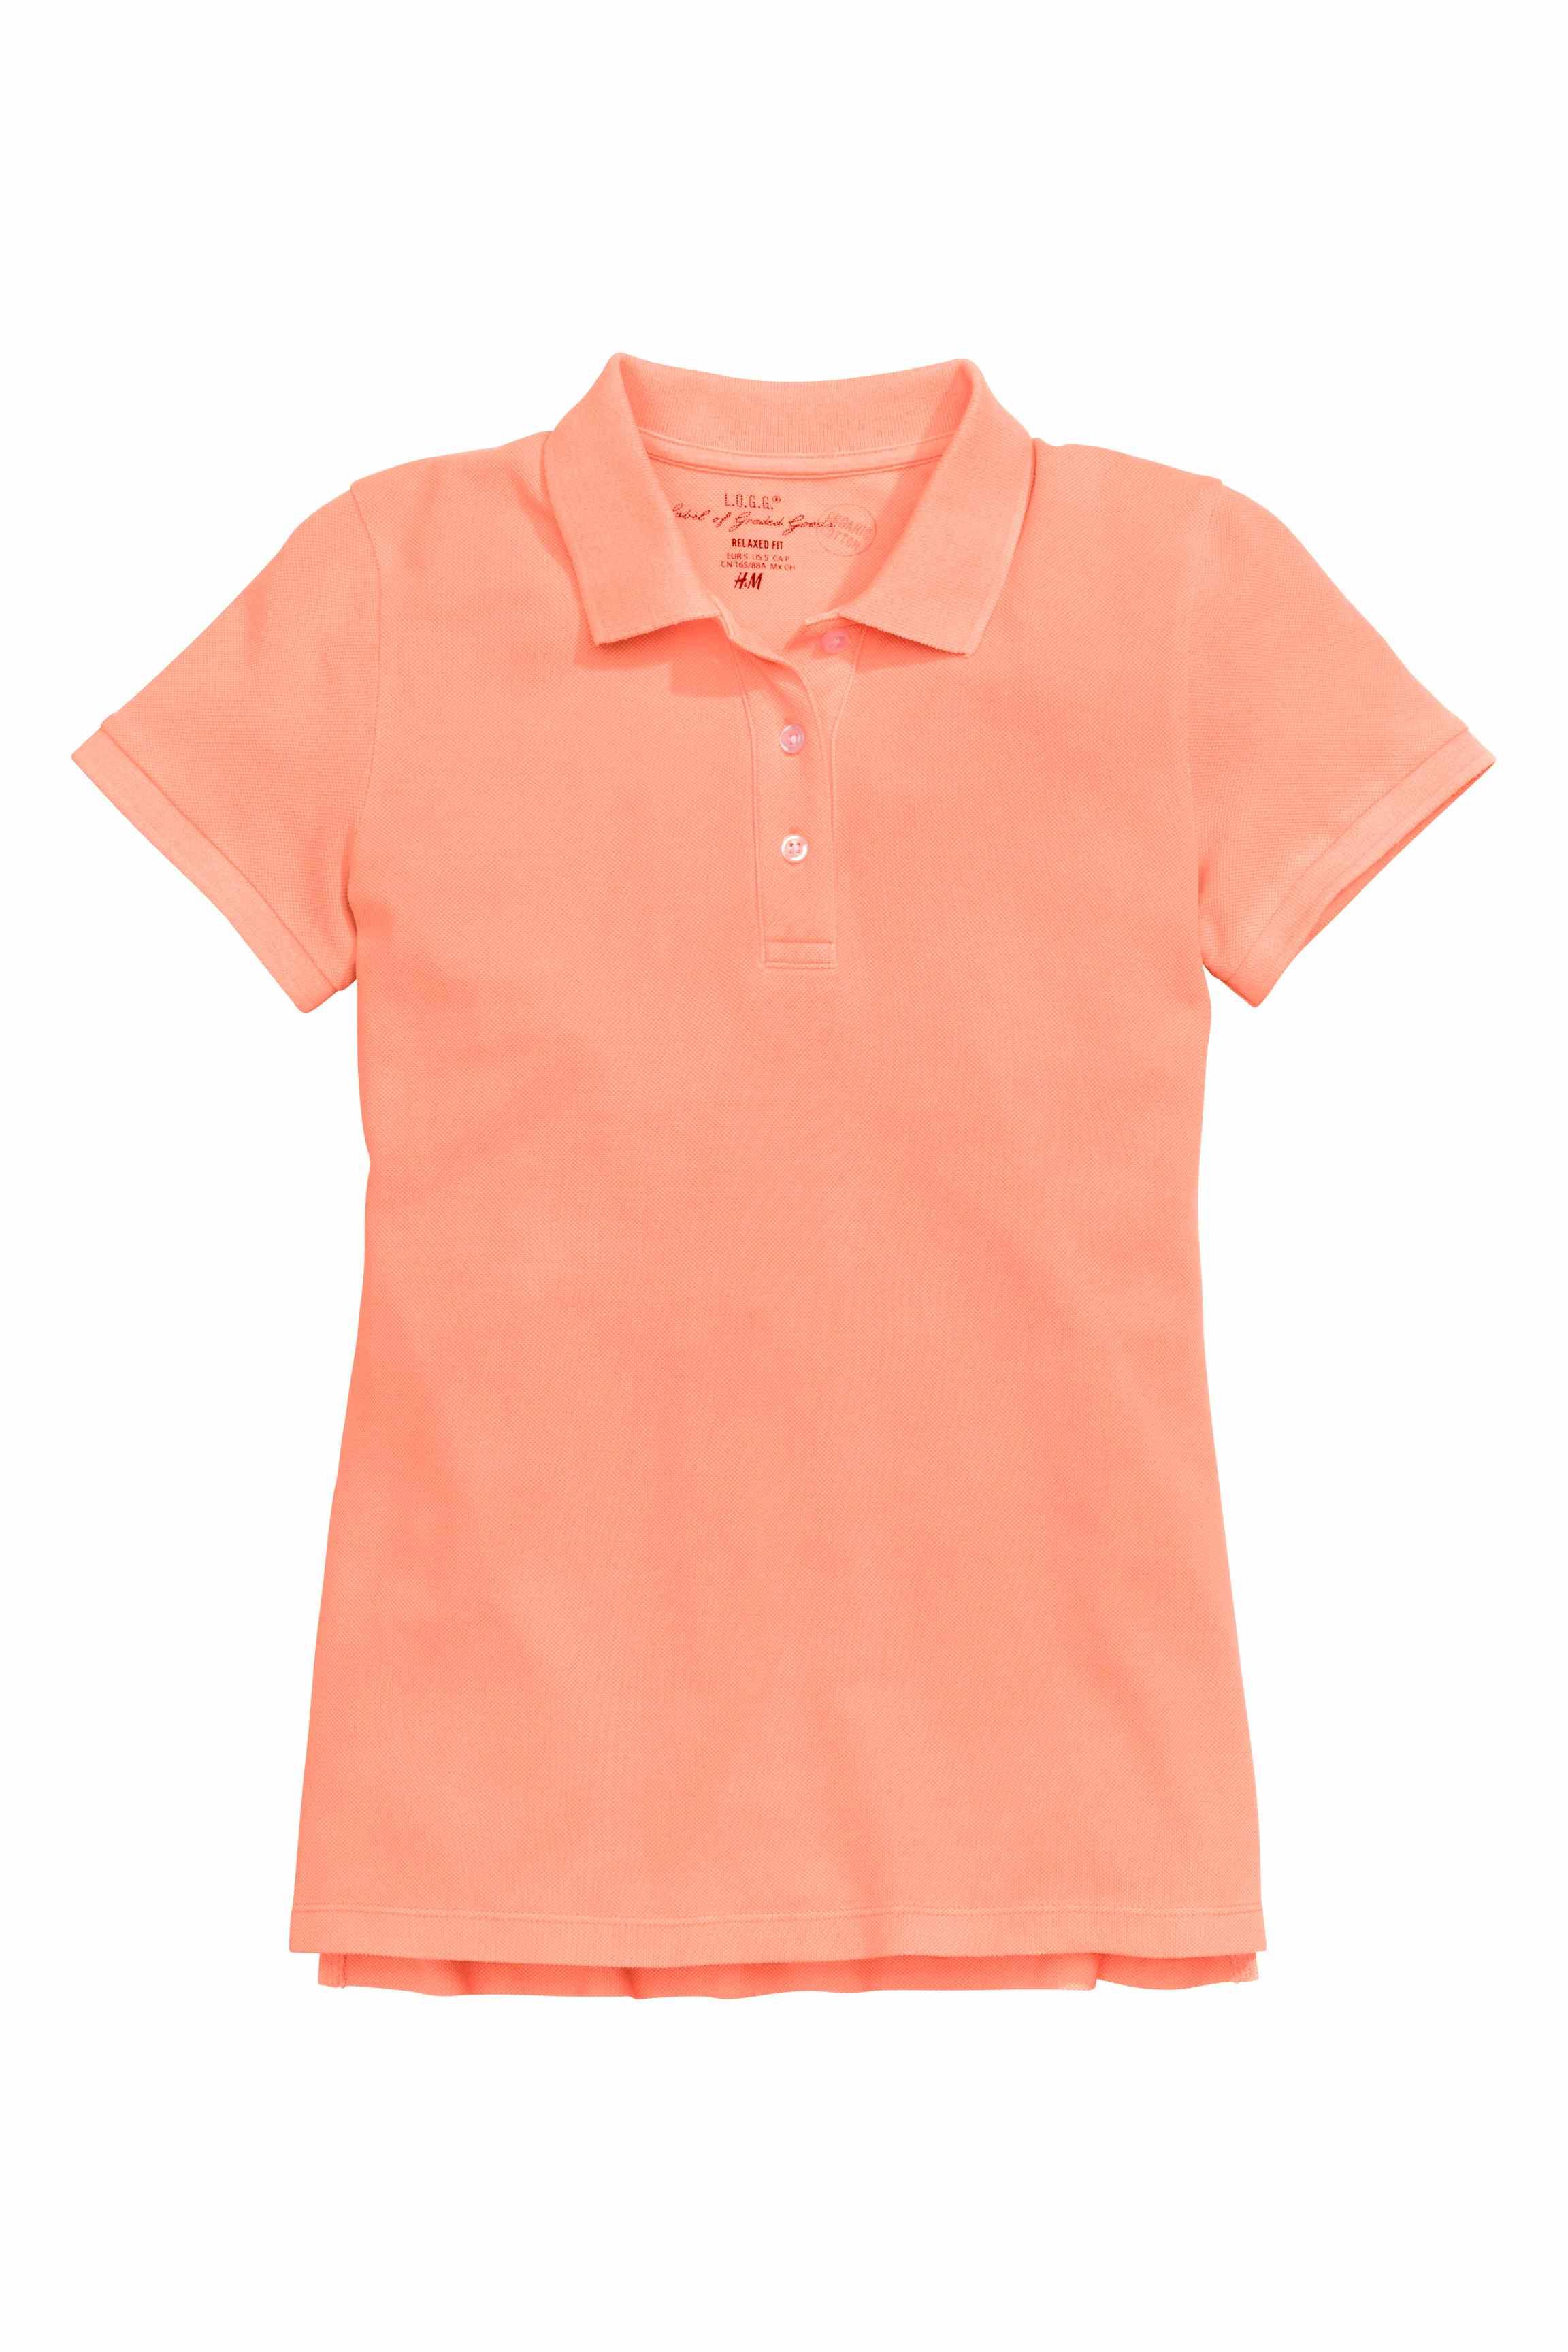 H m polo shirt in orange lyst for H m polo shirt womens